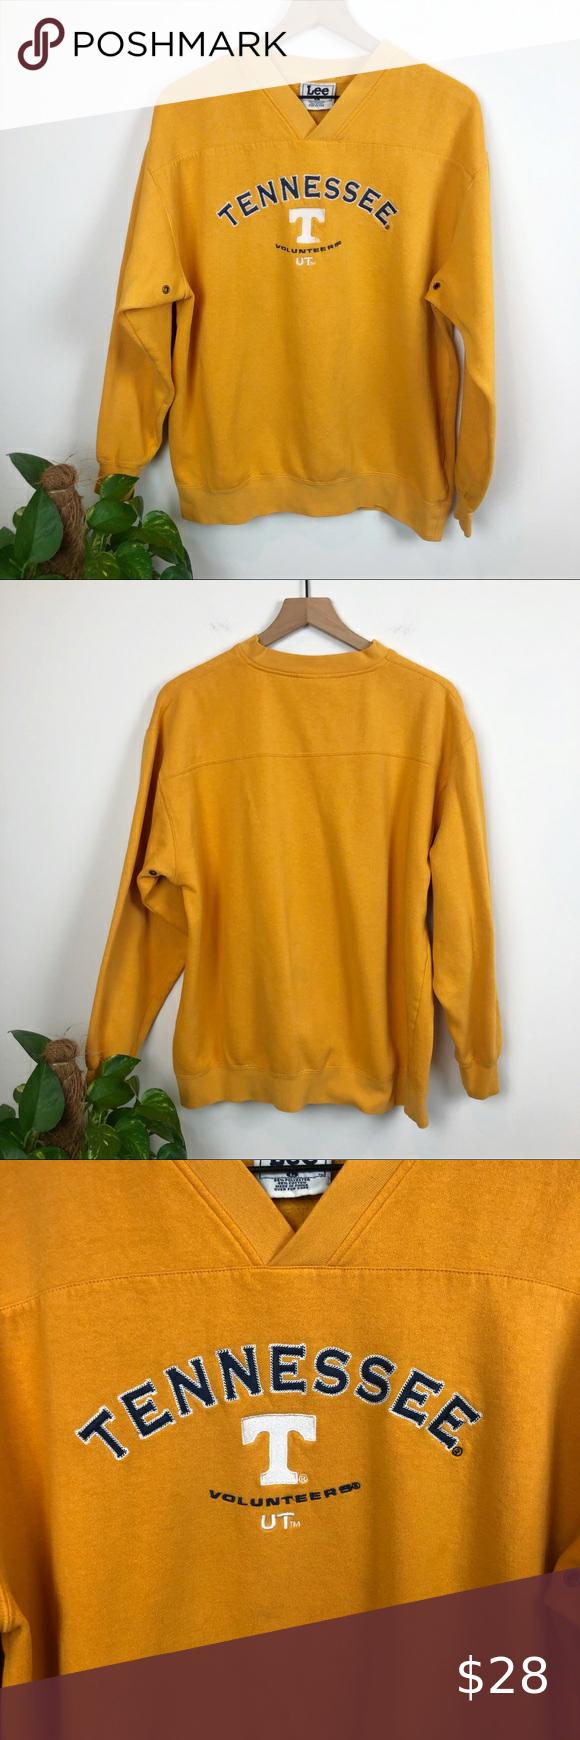 Vtg Oversized University Of Tennessee Sweatshirt Sweatshirts Vintage Sweatshirt Embroidered Sweatshirts [ 1740 x 580 Pixel ]